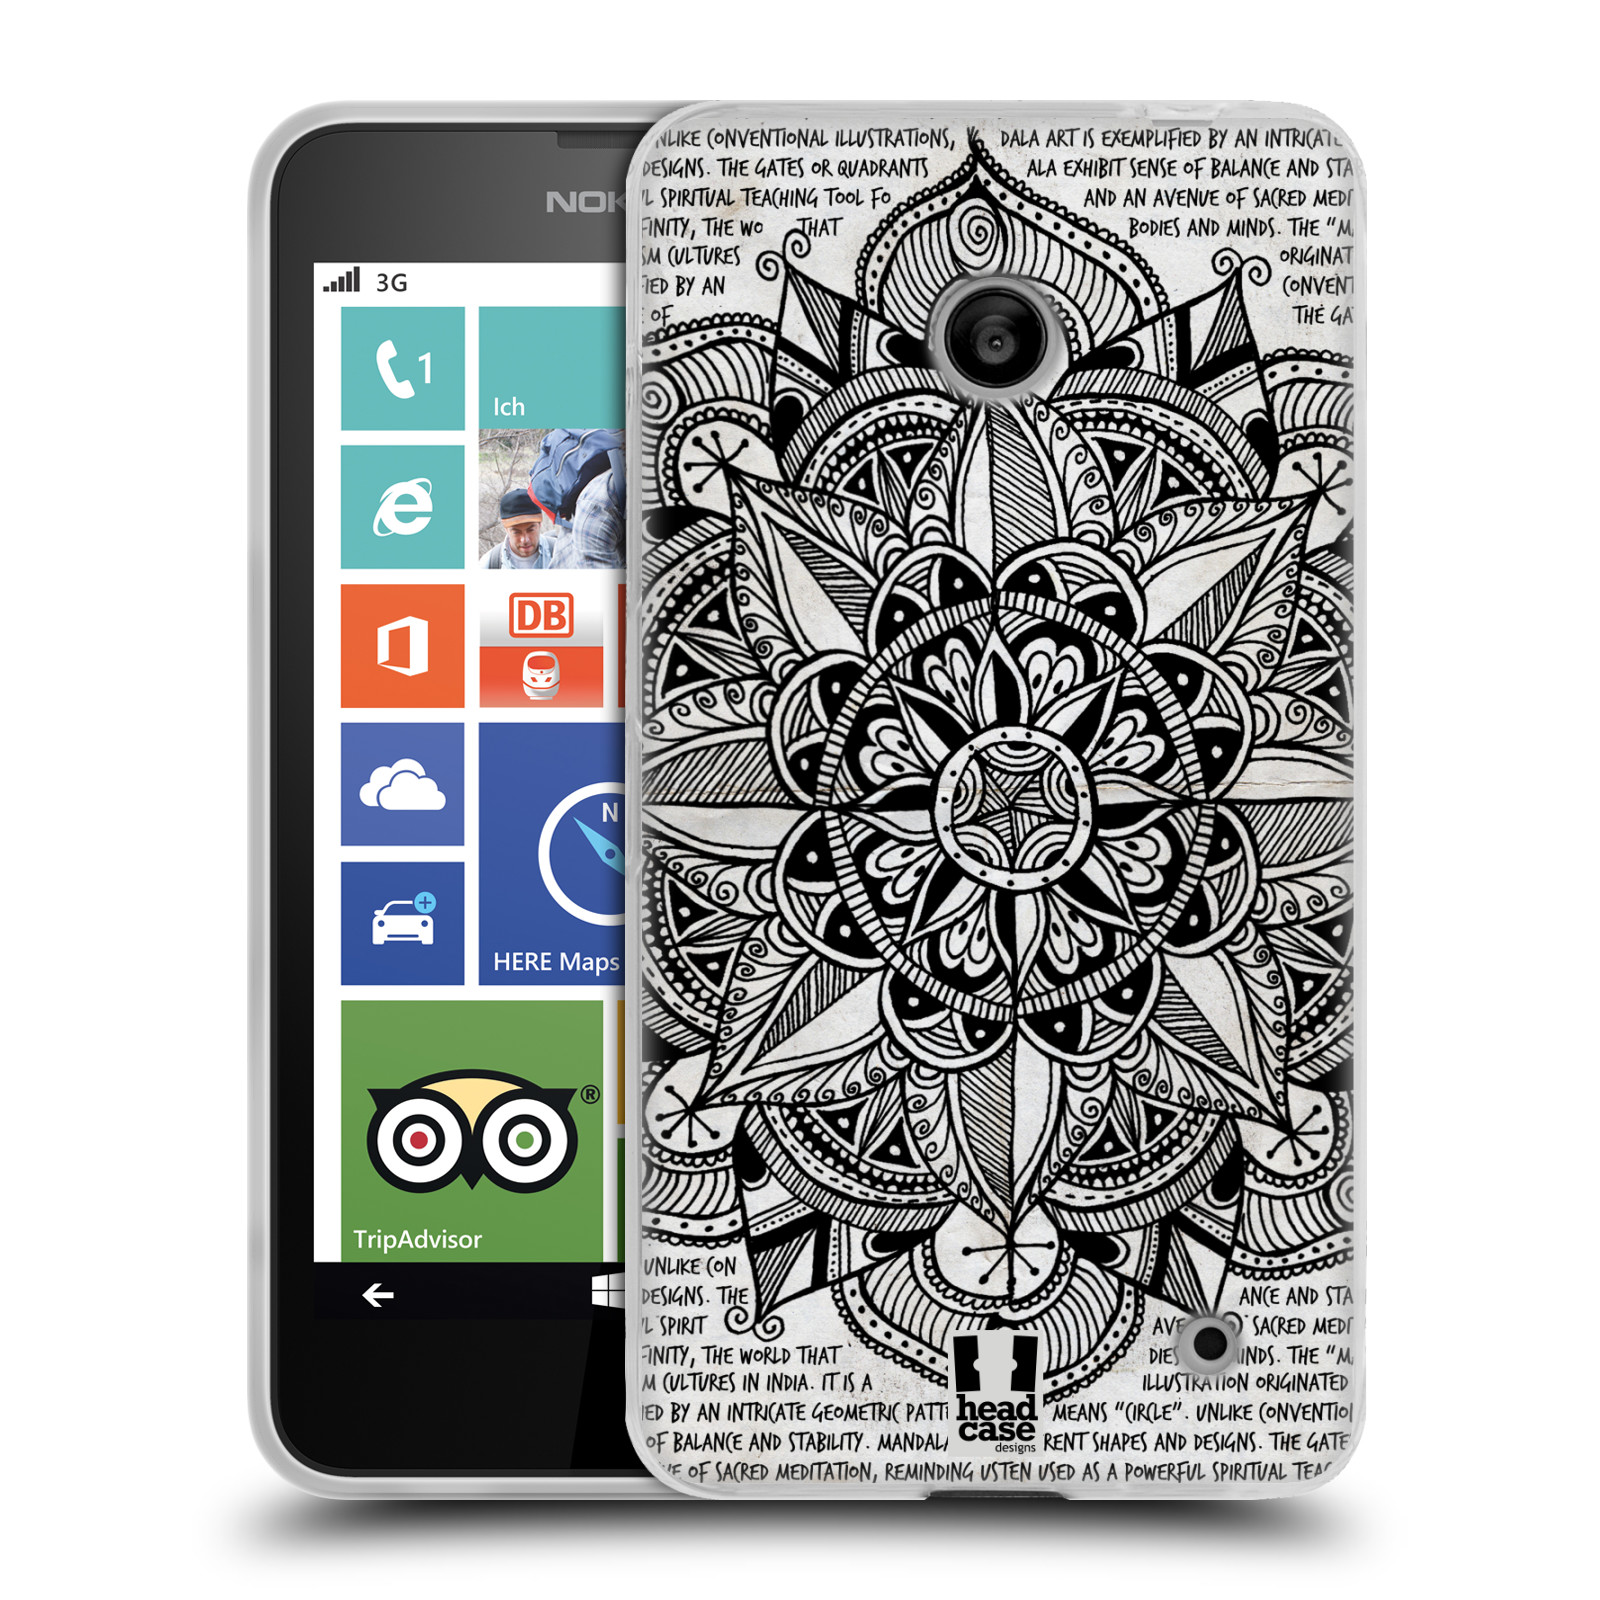 Silikonové pouzdro na mobil Nokia Lumia 630 HEAD CASE Mandala Doodle Paper (Silikonový kryt či obal na mobilní telefon Nokia Lumia 630 a Nokia Lumia 630 Dual SIM)